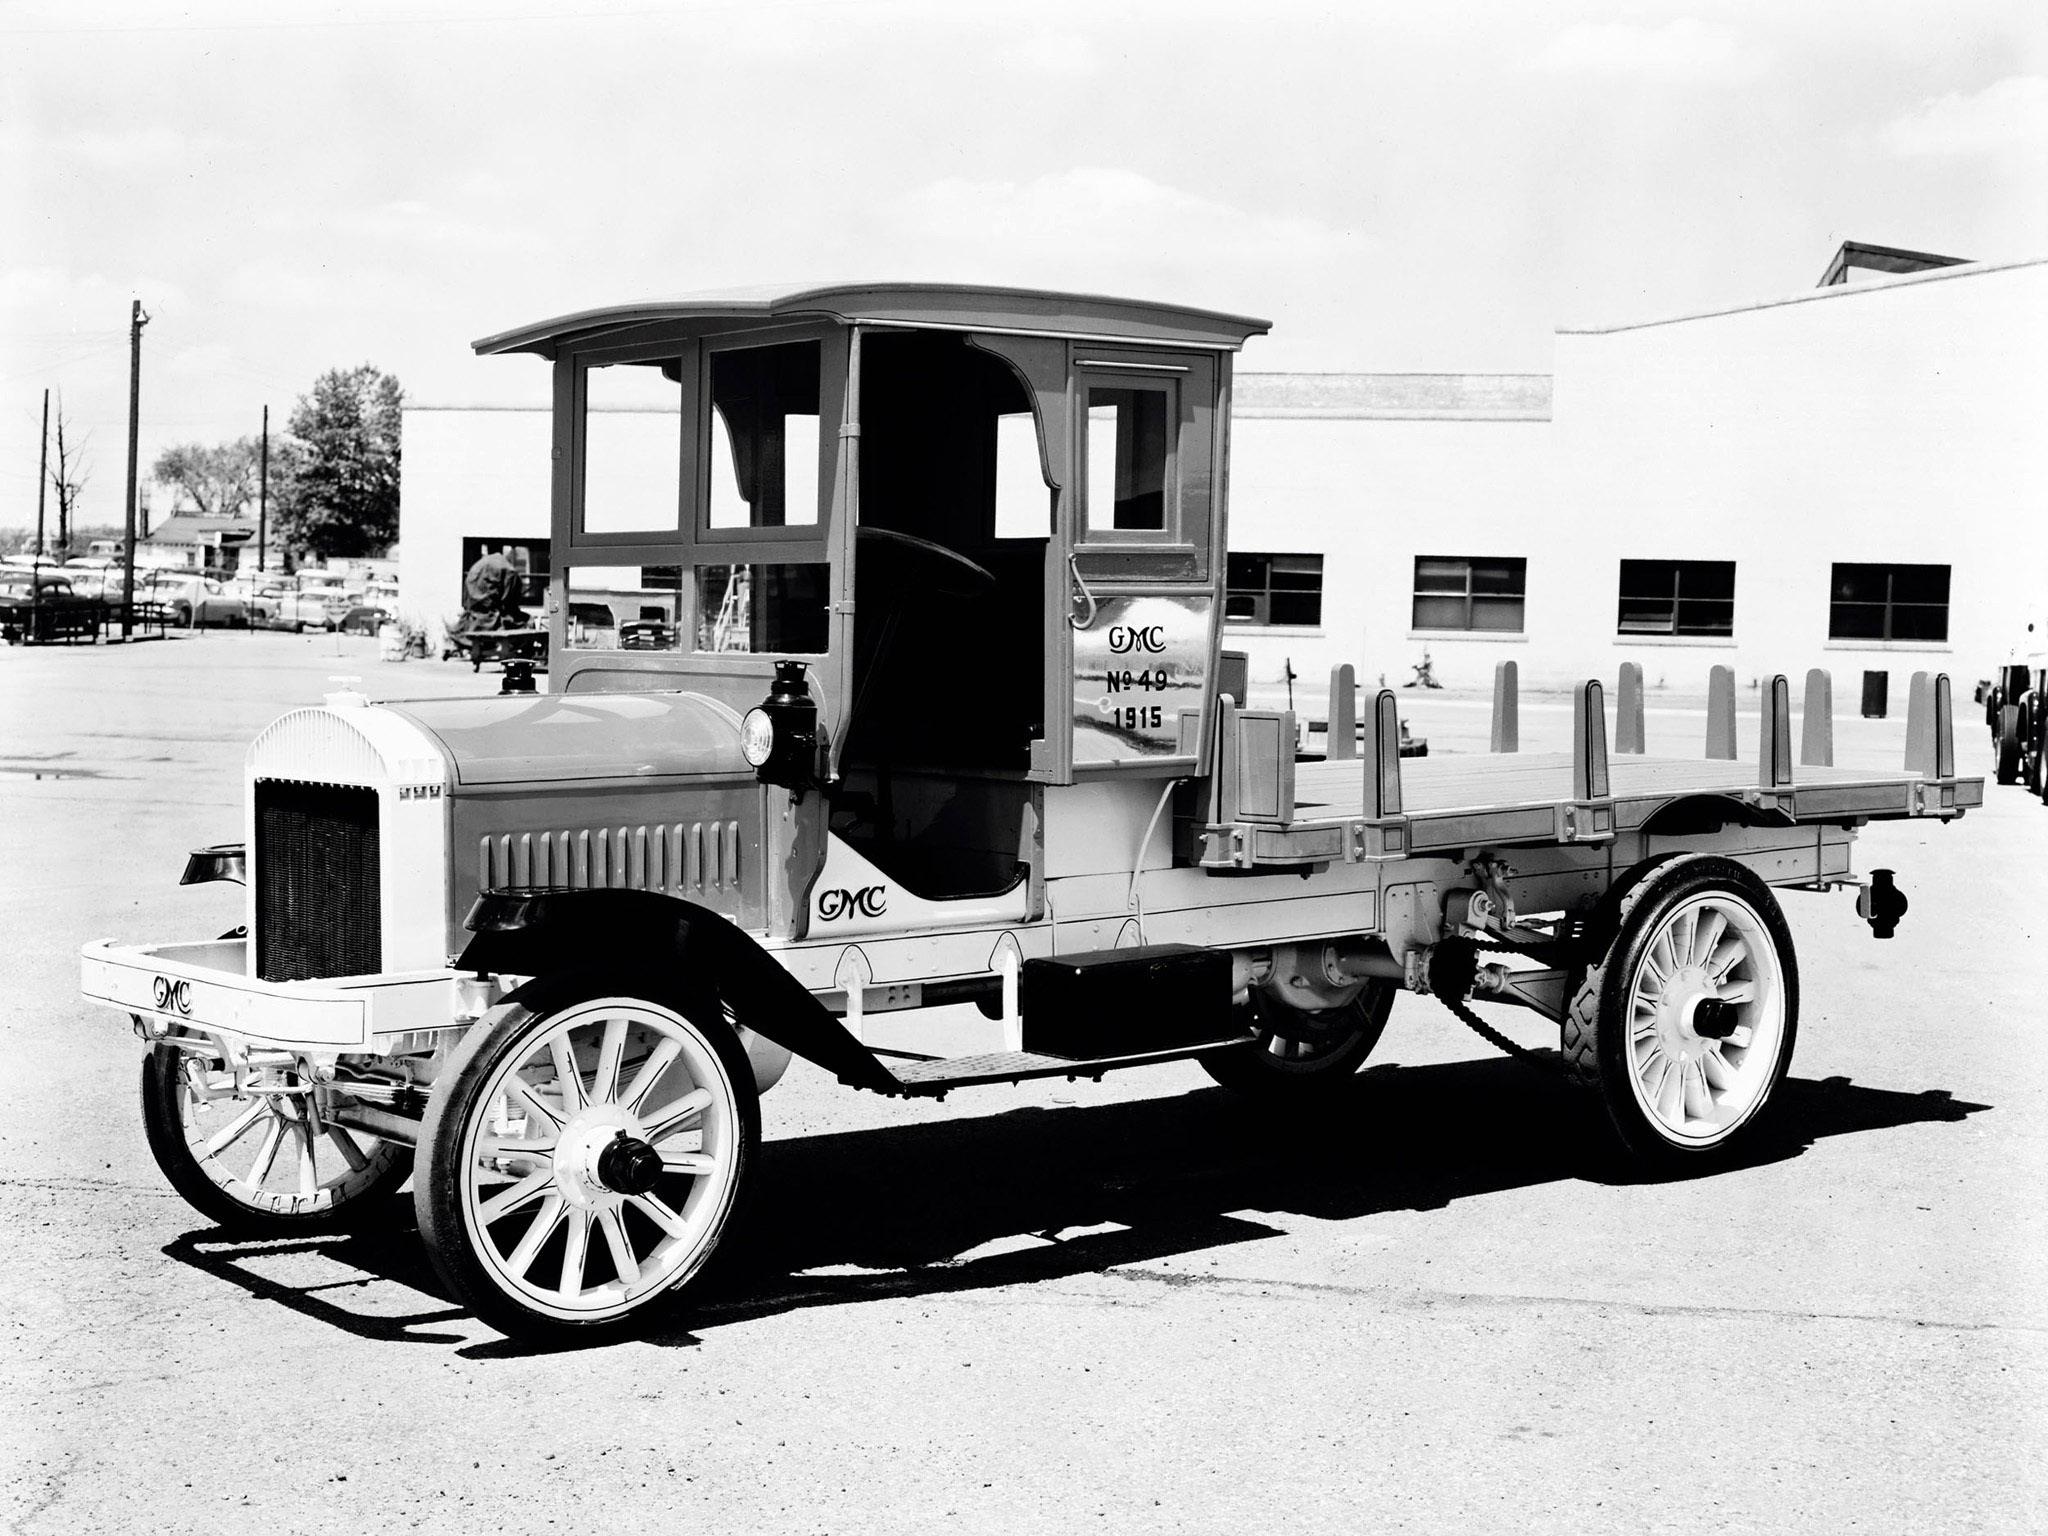 1915 GMC 40A